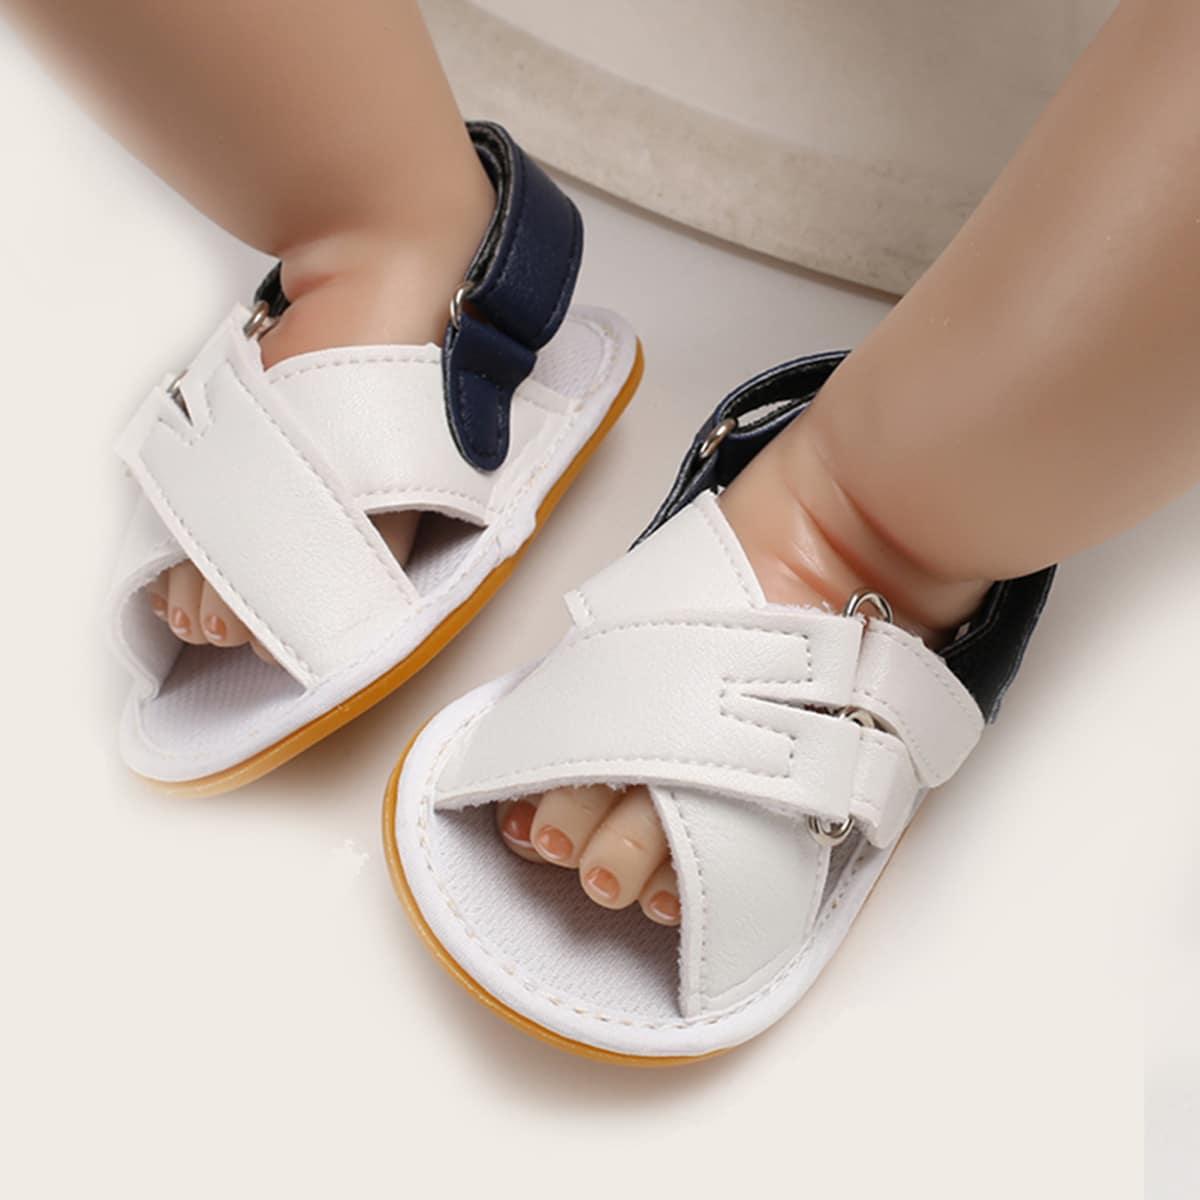 SHEIN Samessandalen Kleurblok Baby sandaaltjes